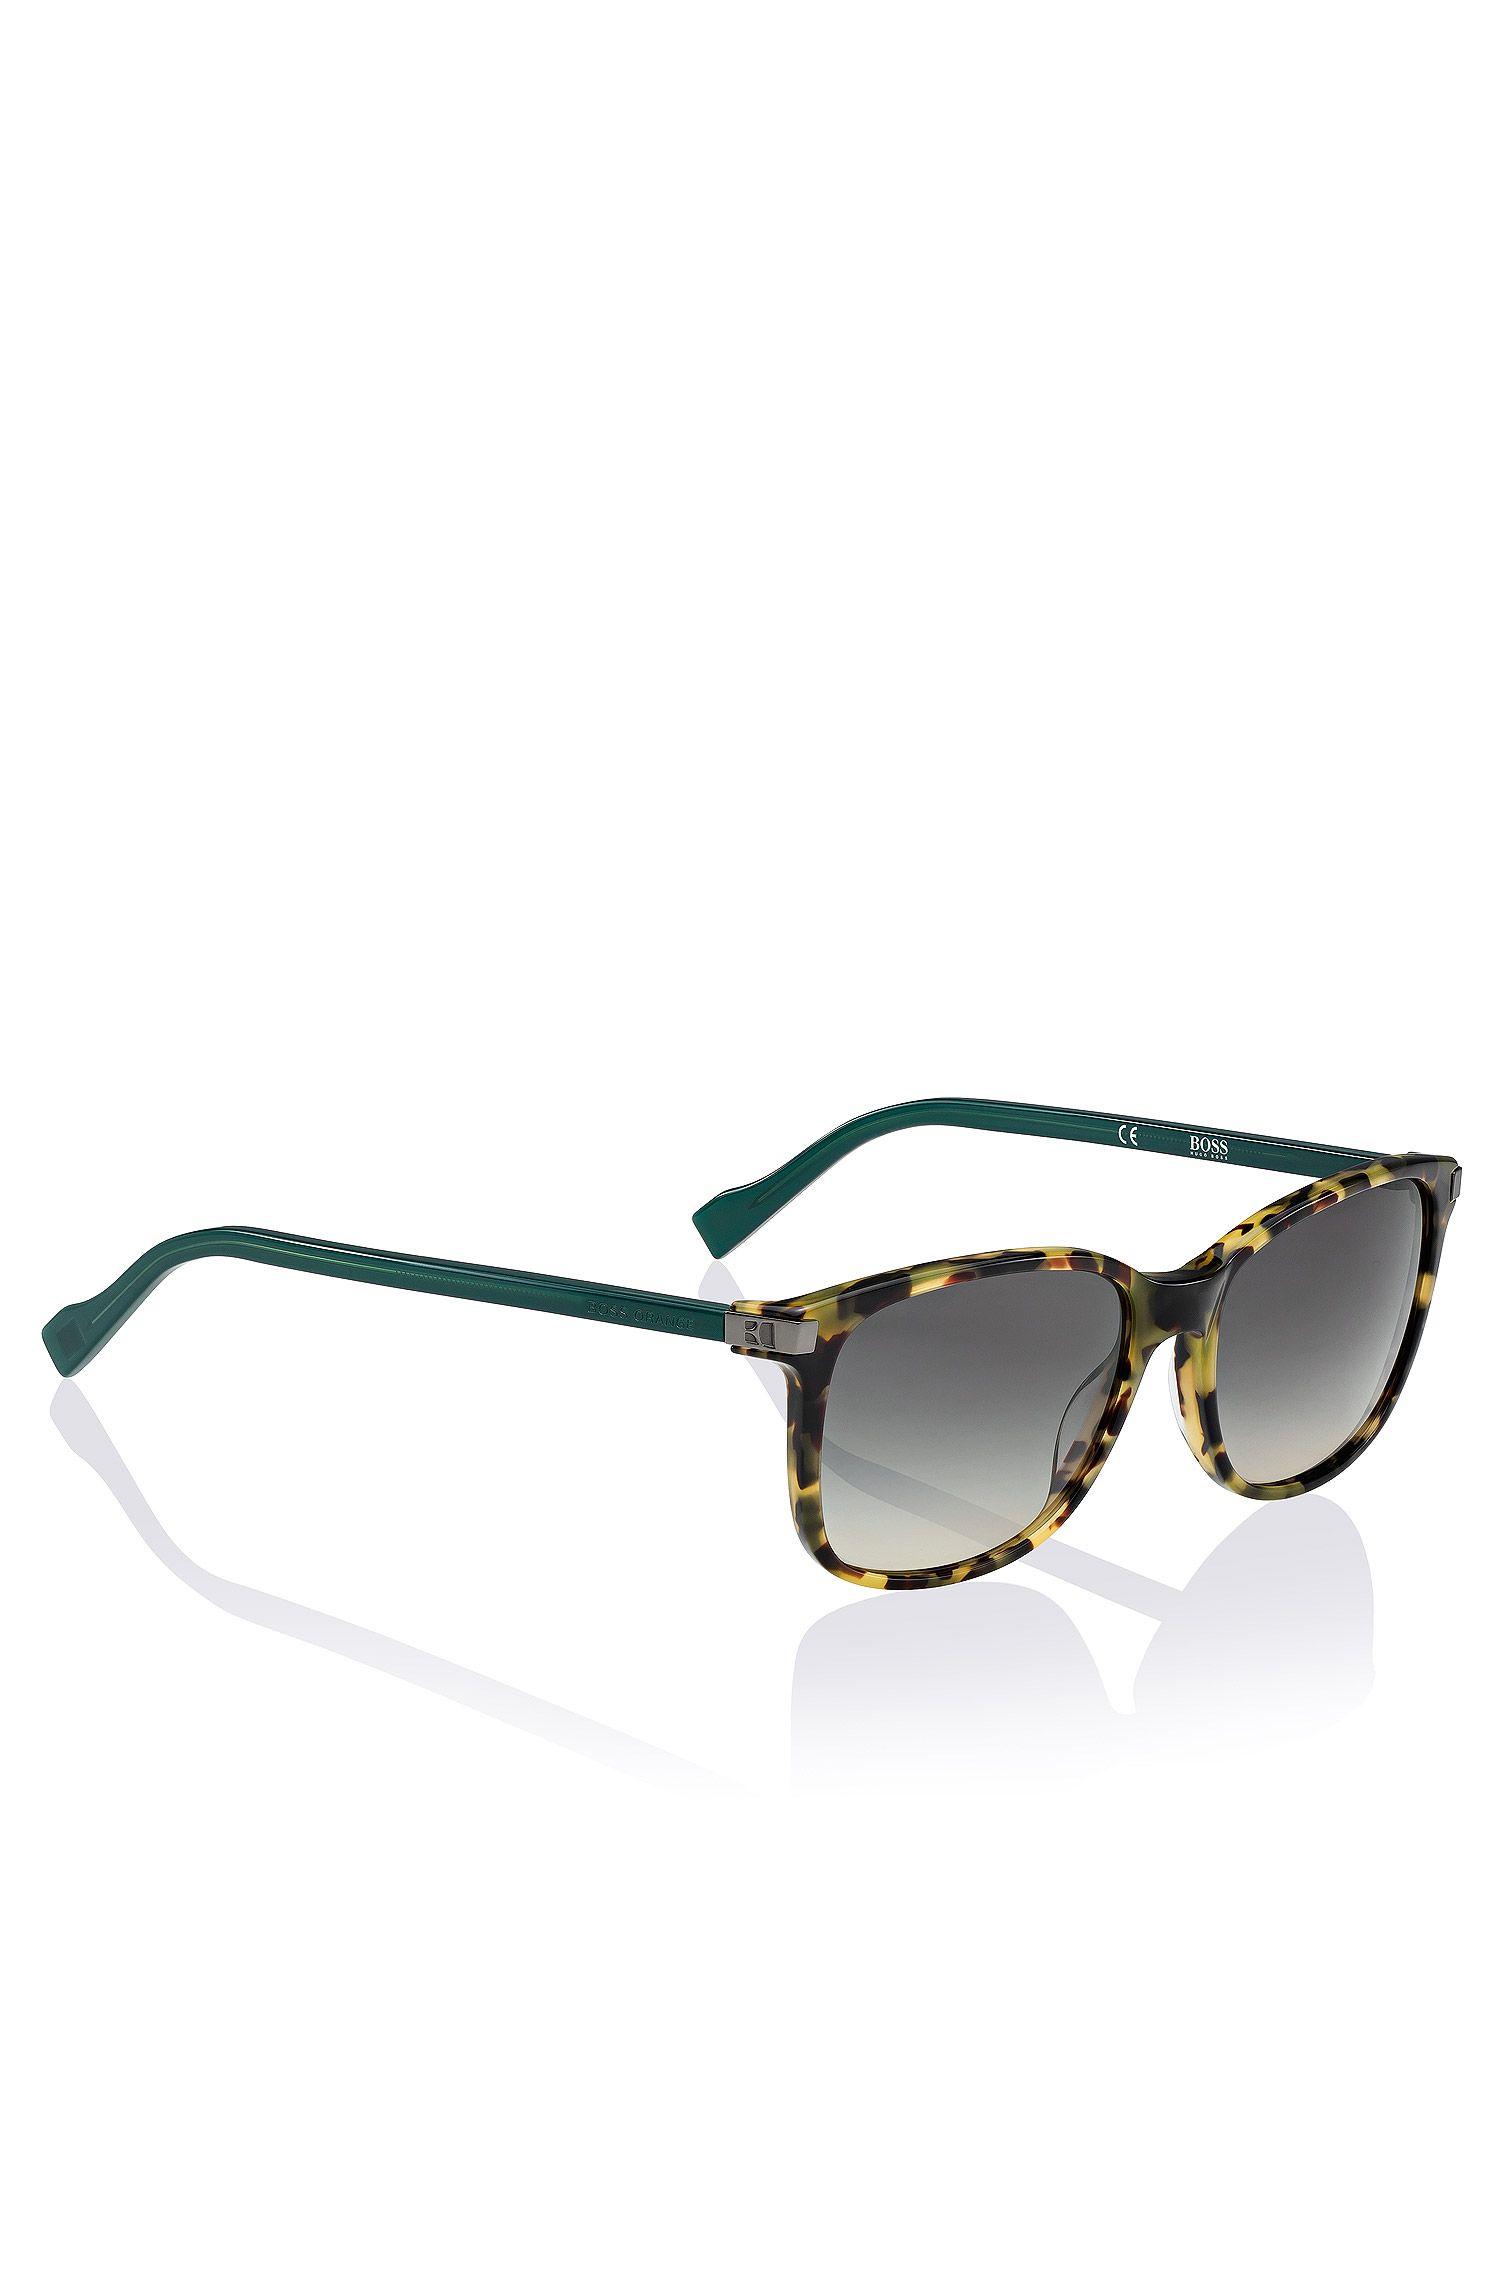 Gafas de sol vintage 'BO 0179/S' en acetato